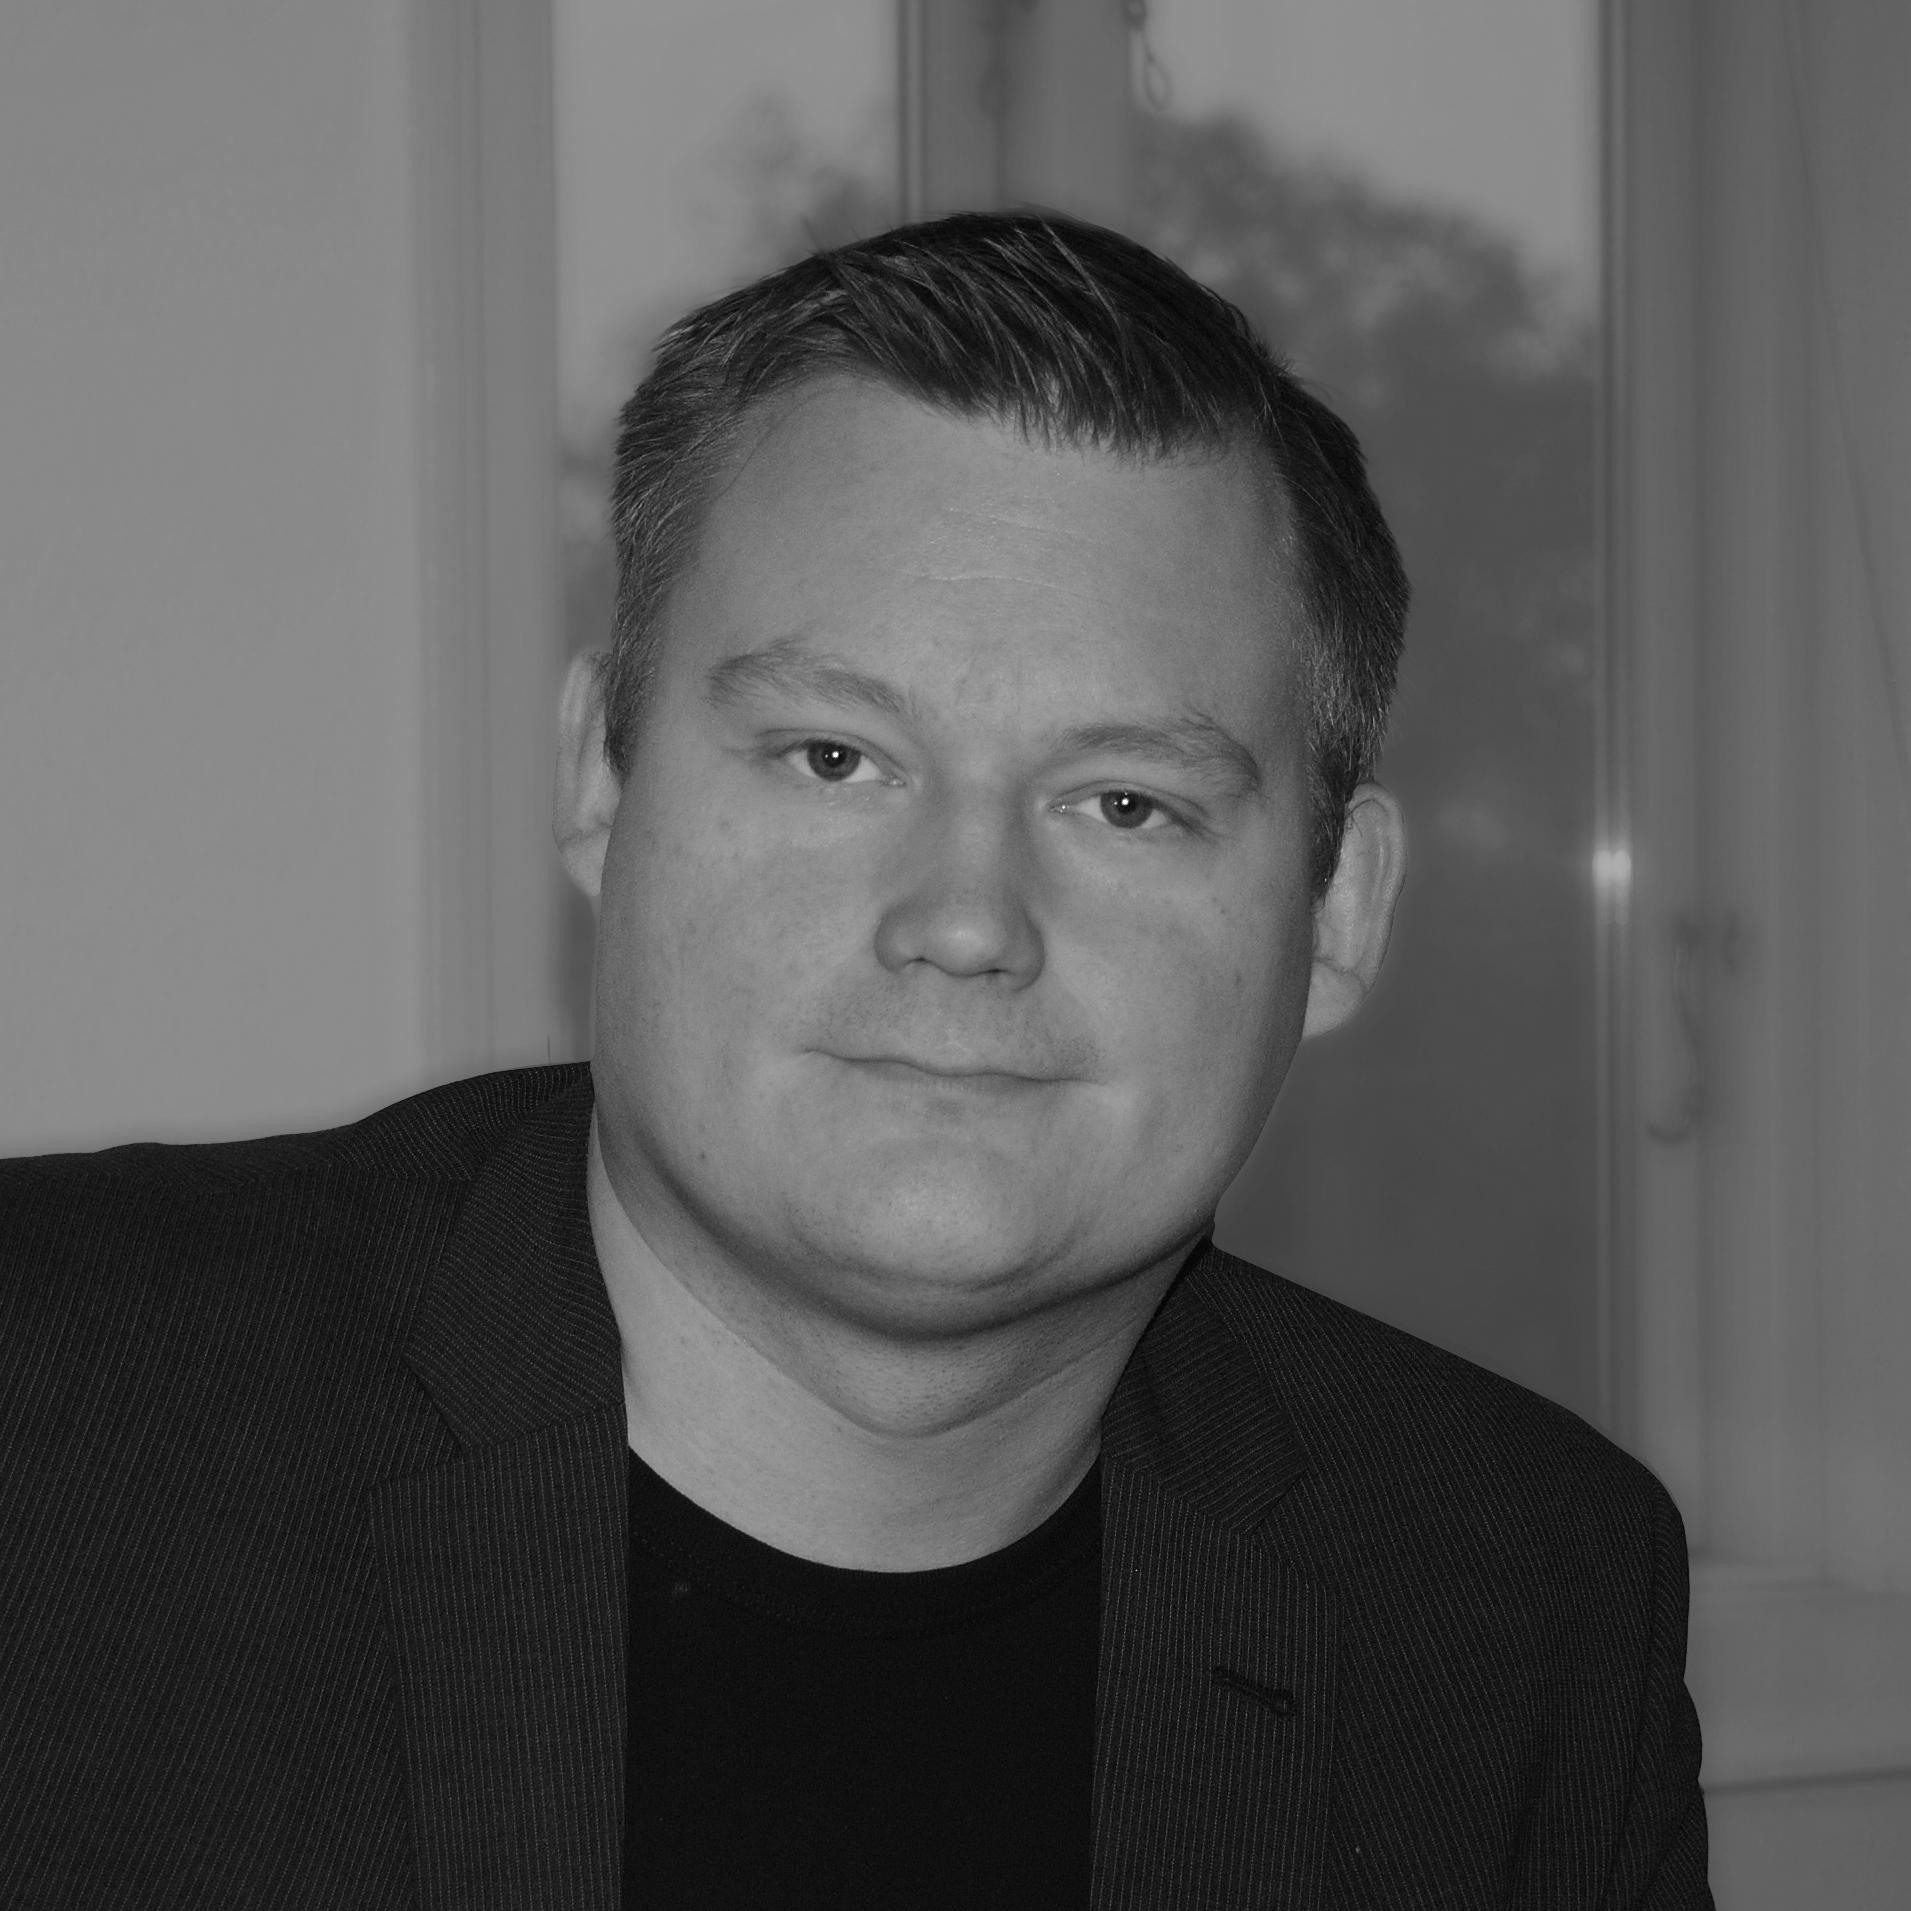 Mikael Strunge